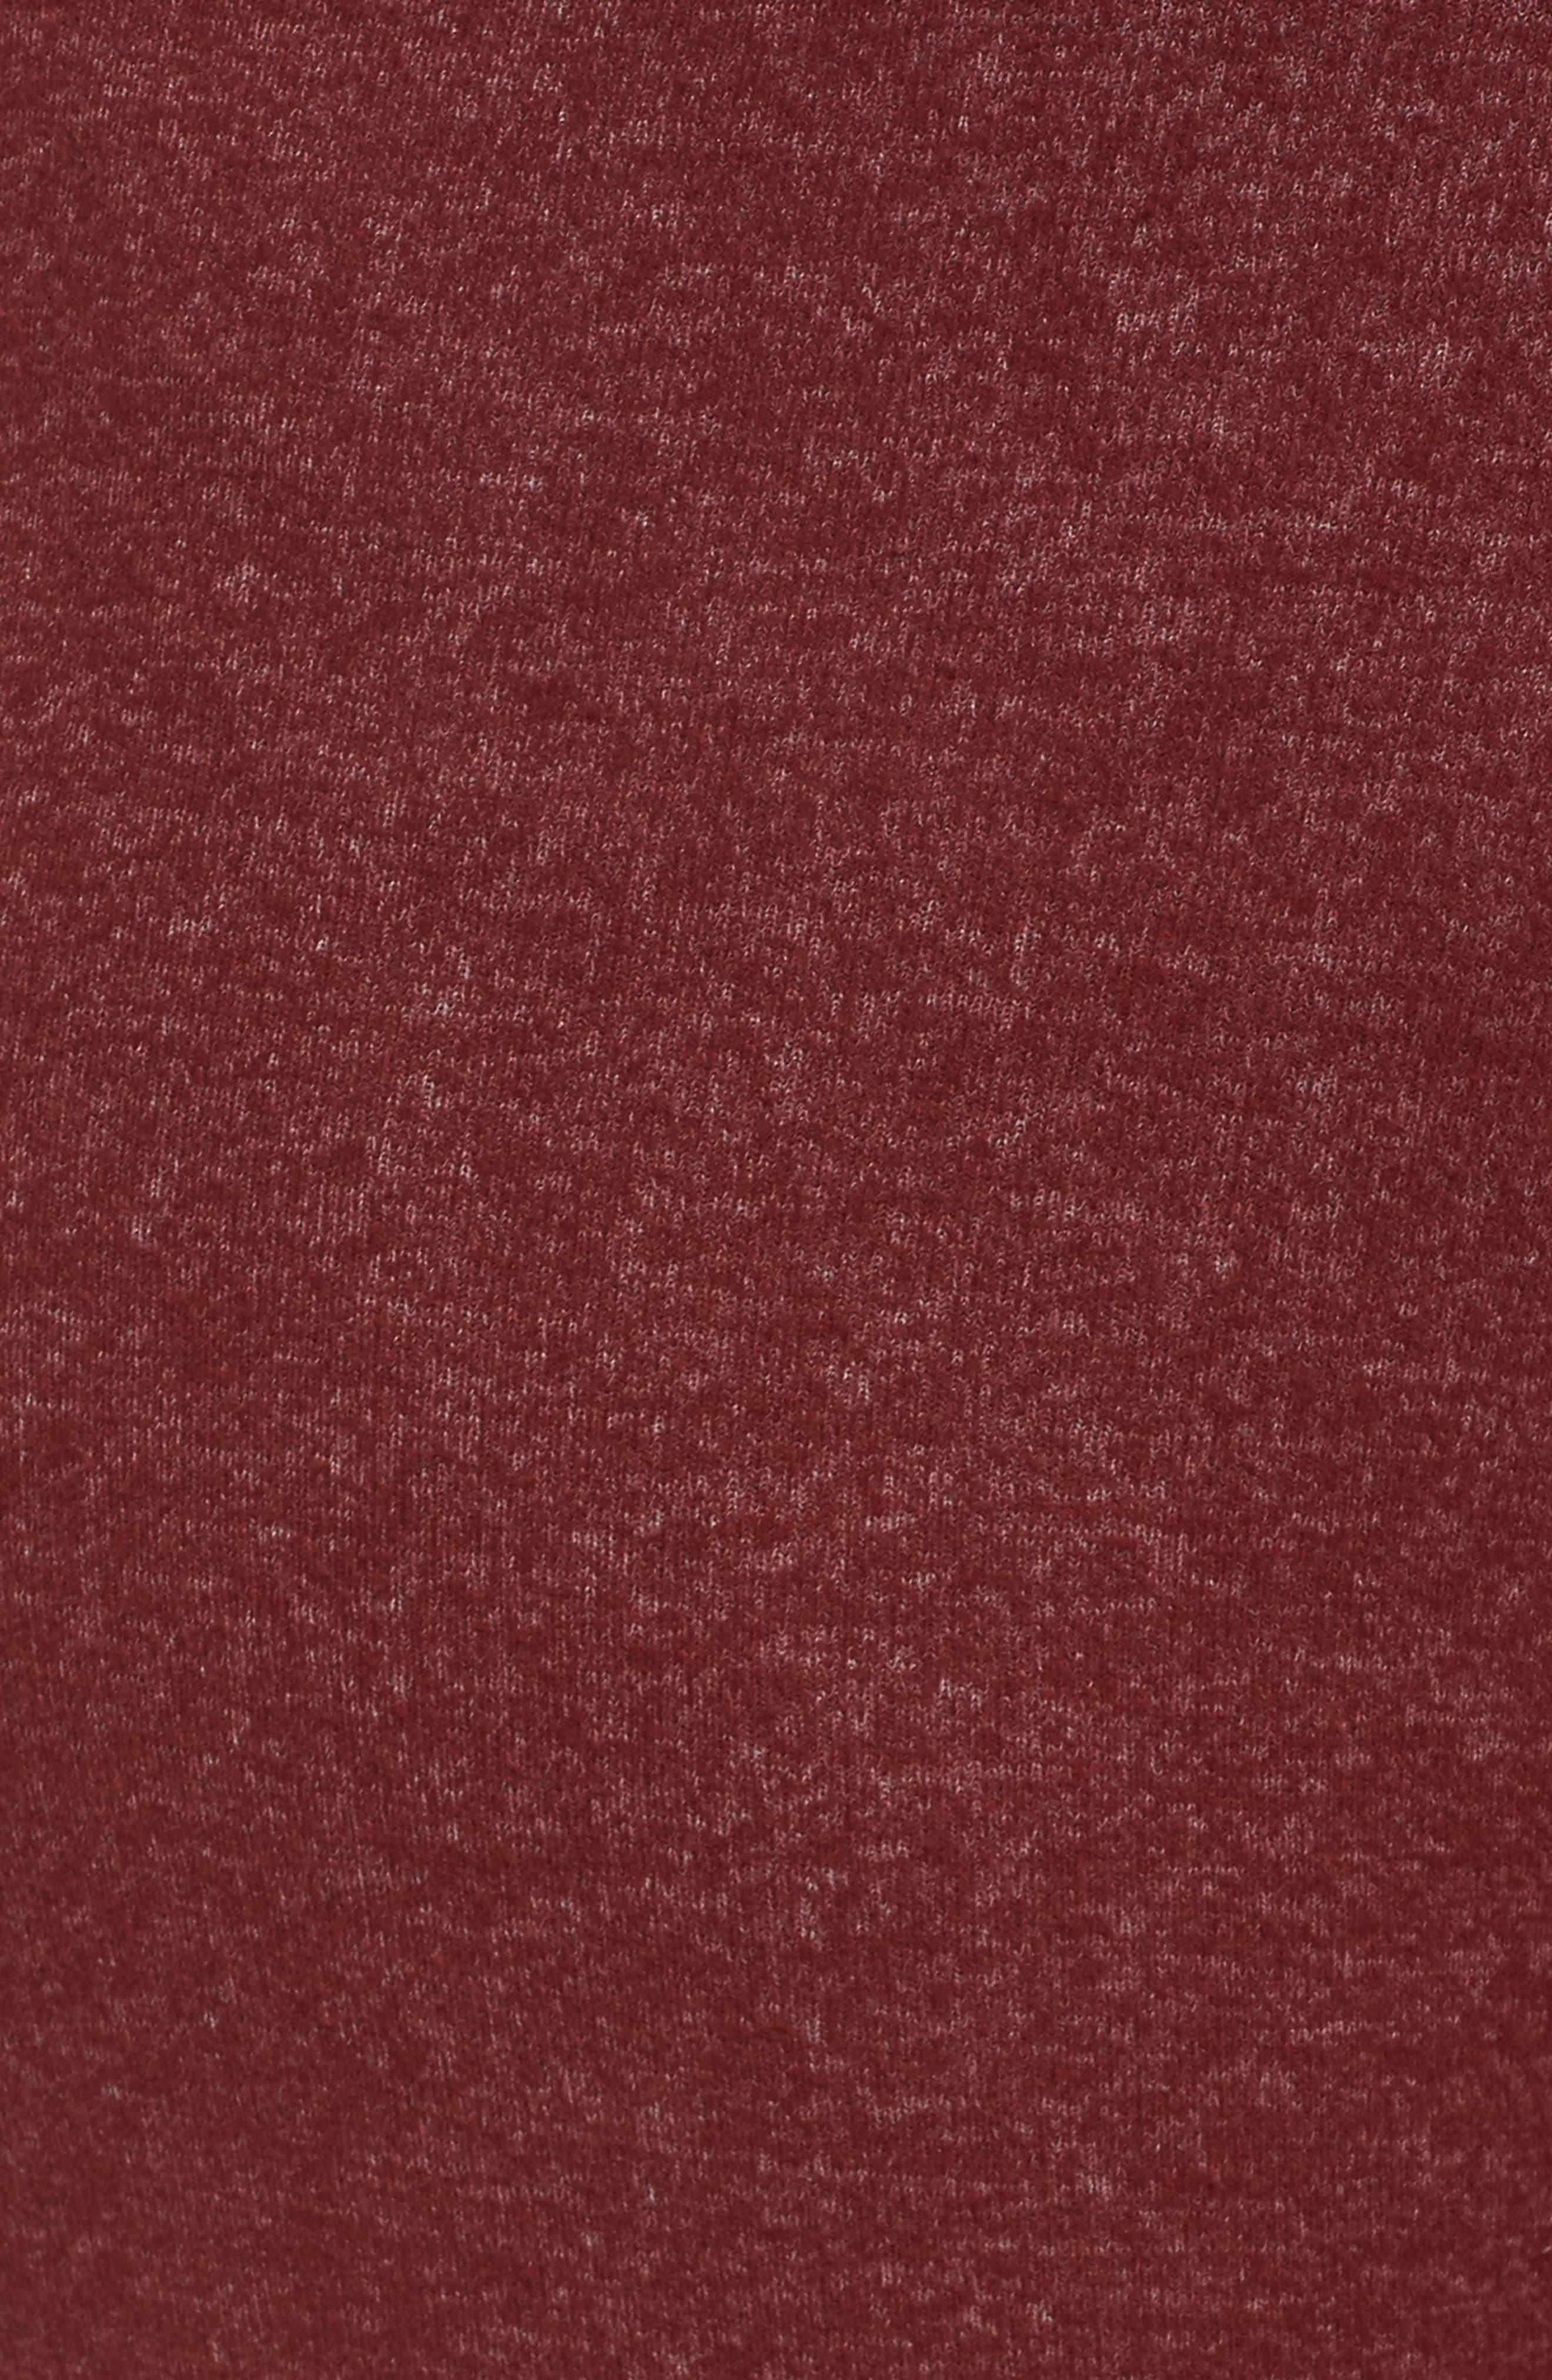 'Best Boyfriend' Brushed Hacci Lounge Pants,                             Alternate thumbnail 6, color,                             Red Grape